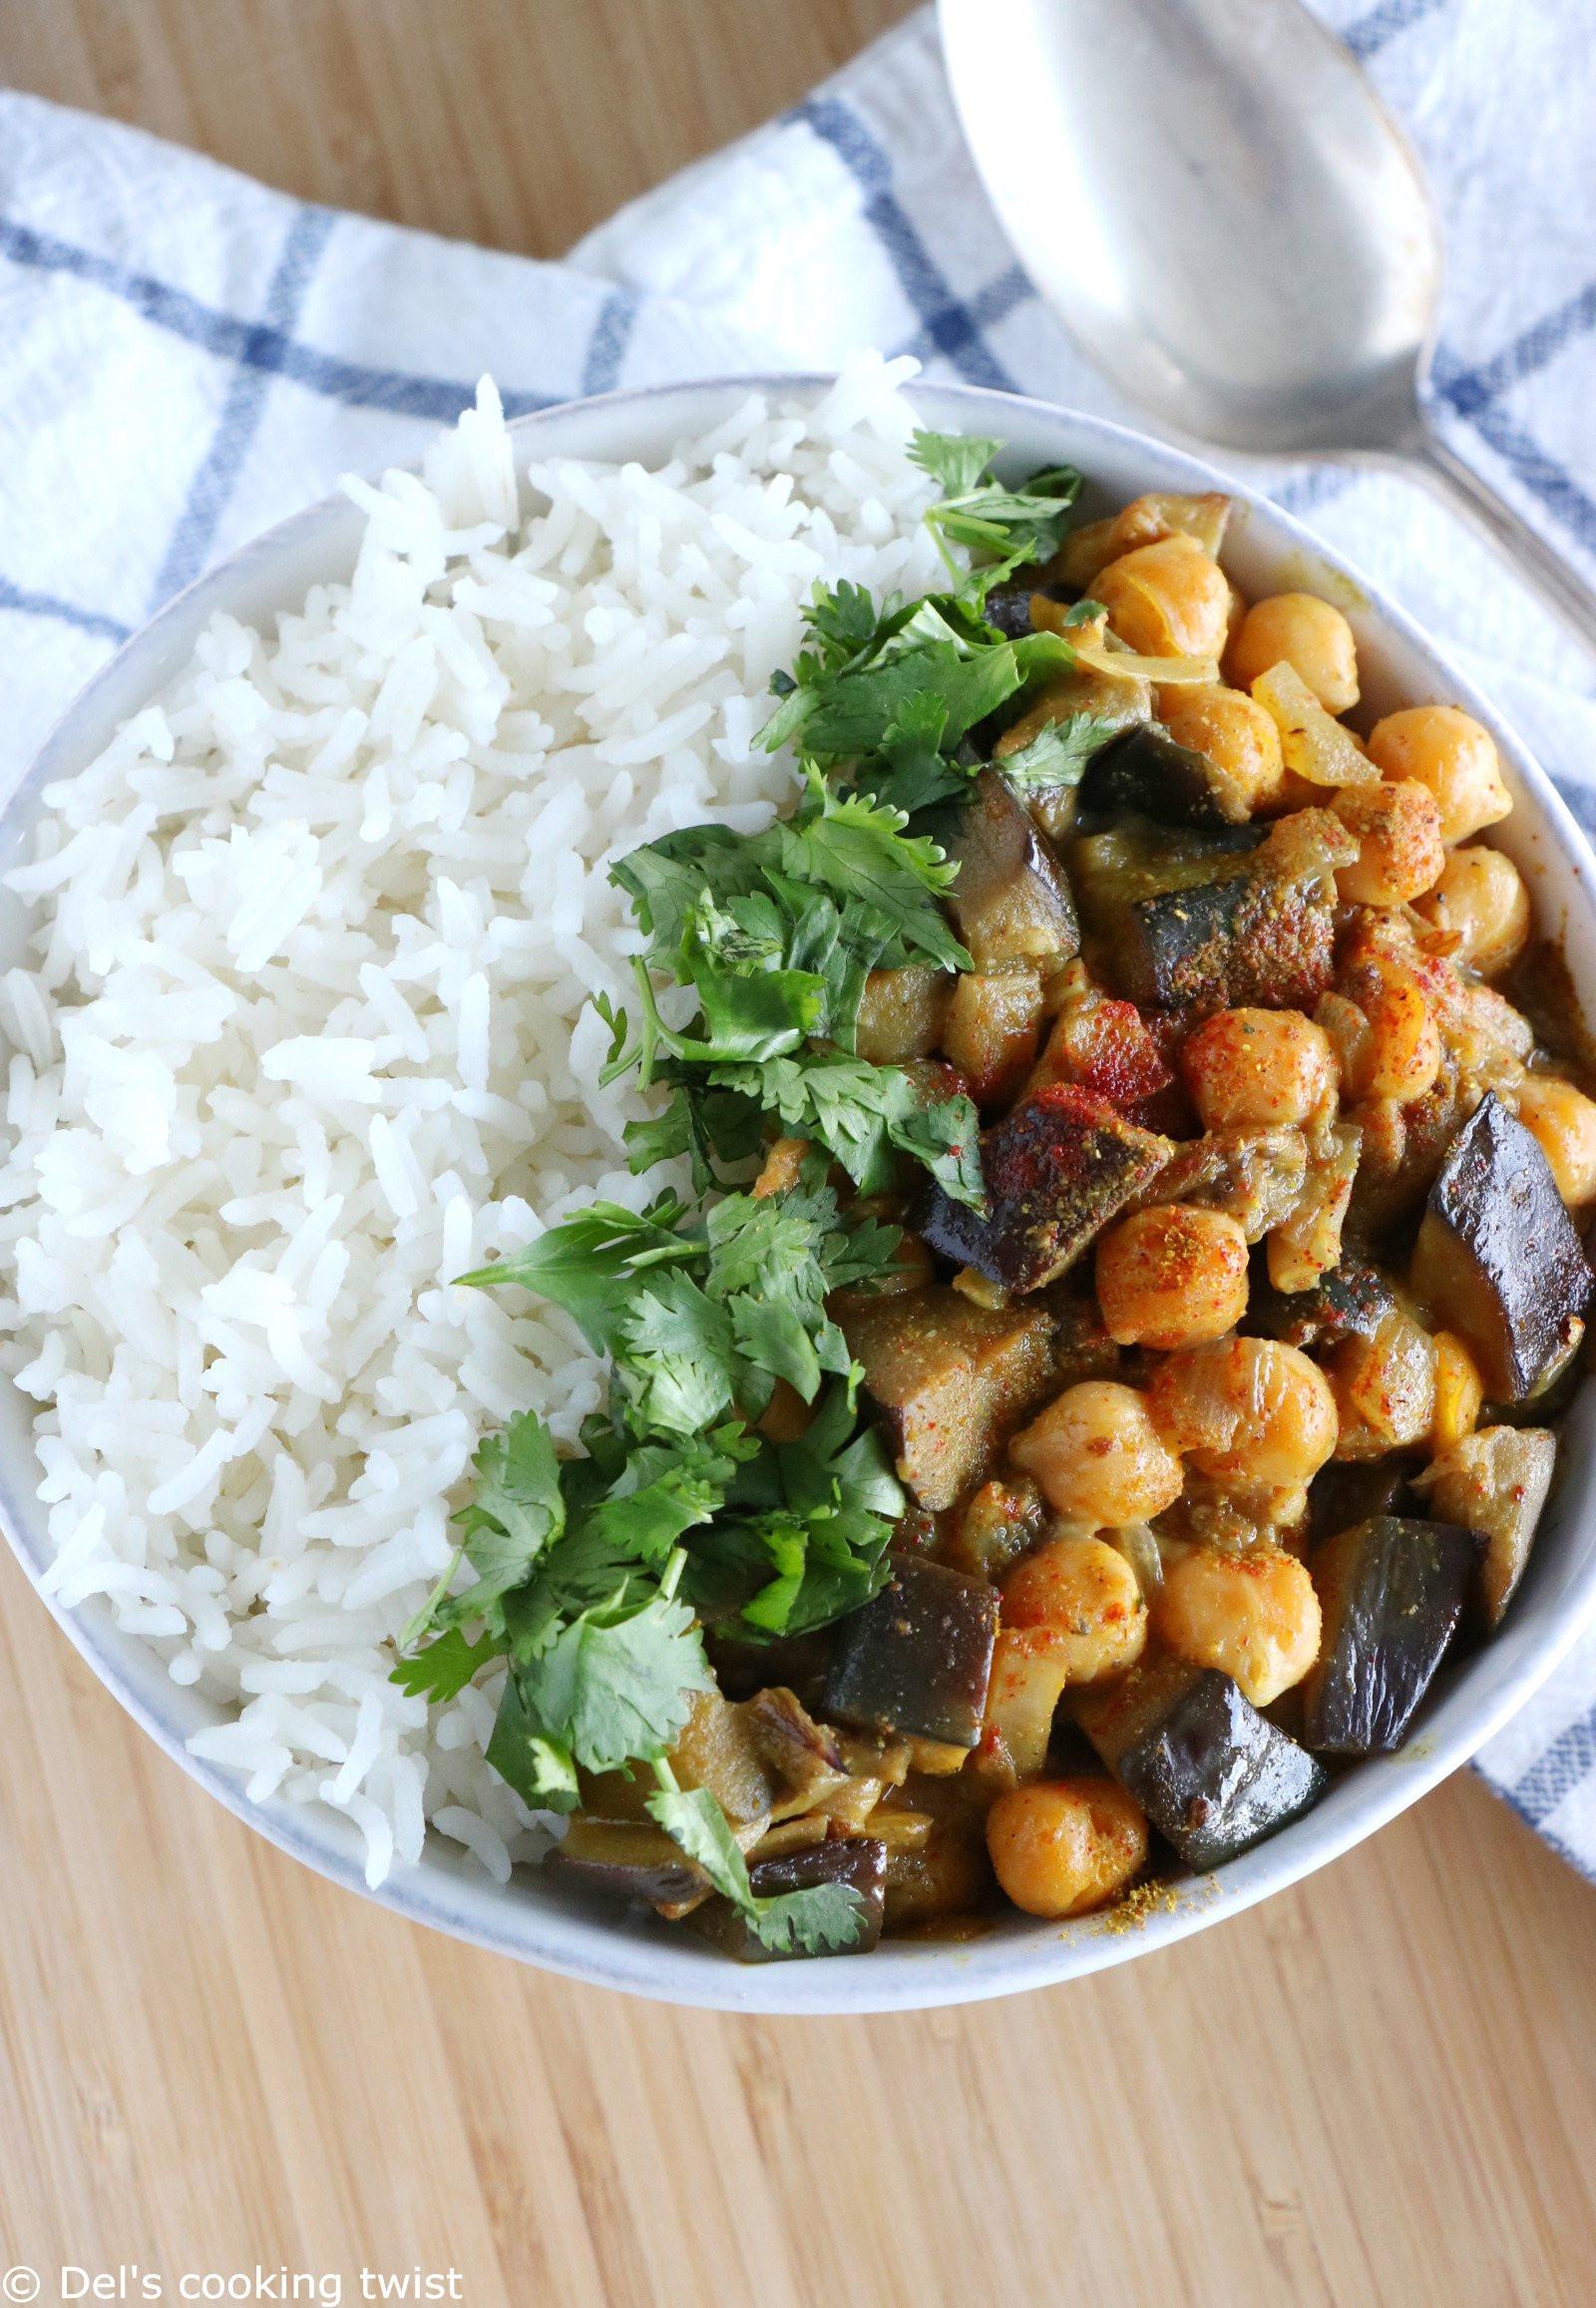 Quick Plant Based Recipes  Easy Eggplant Chickpea Curry Vegan Gluten Free – Del s